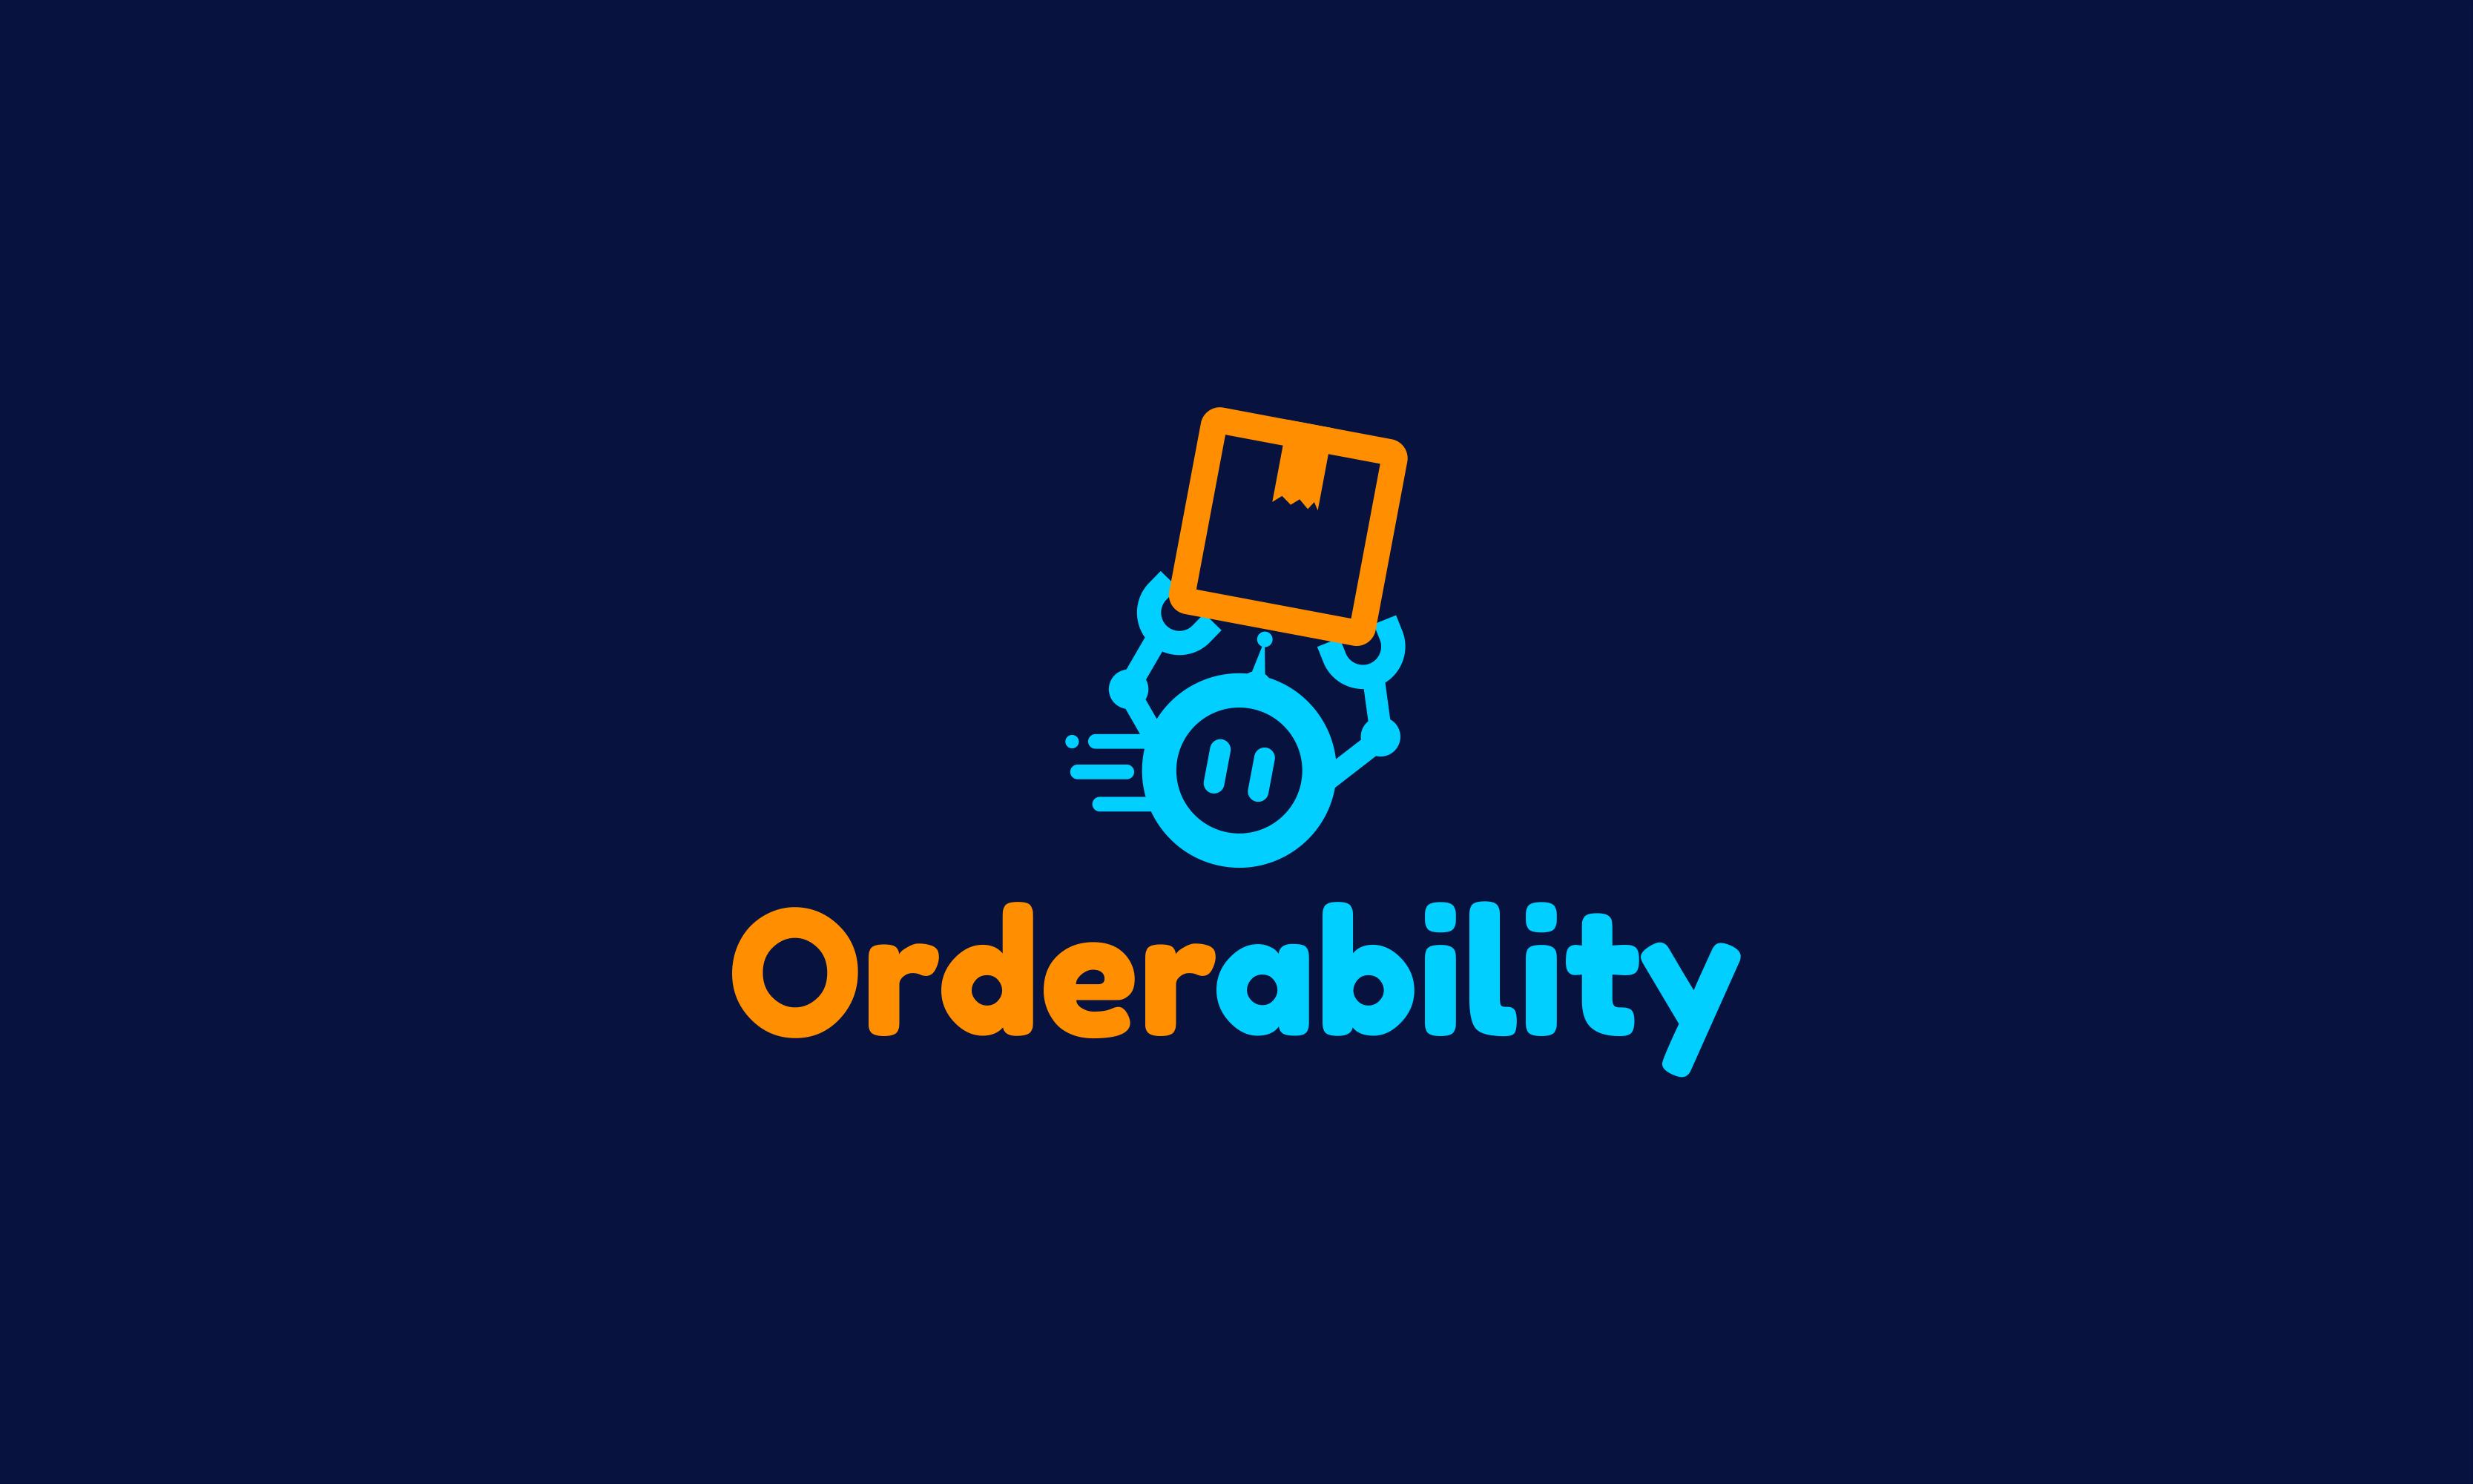 Orderability